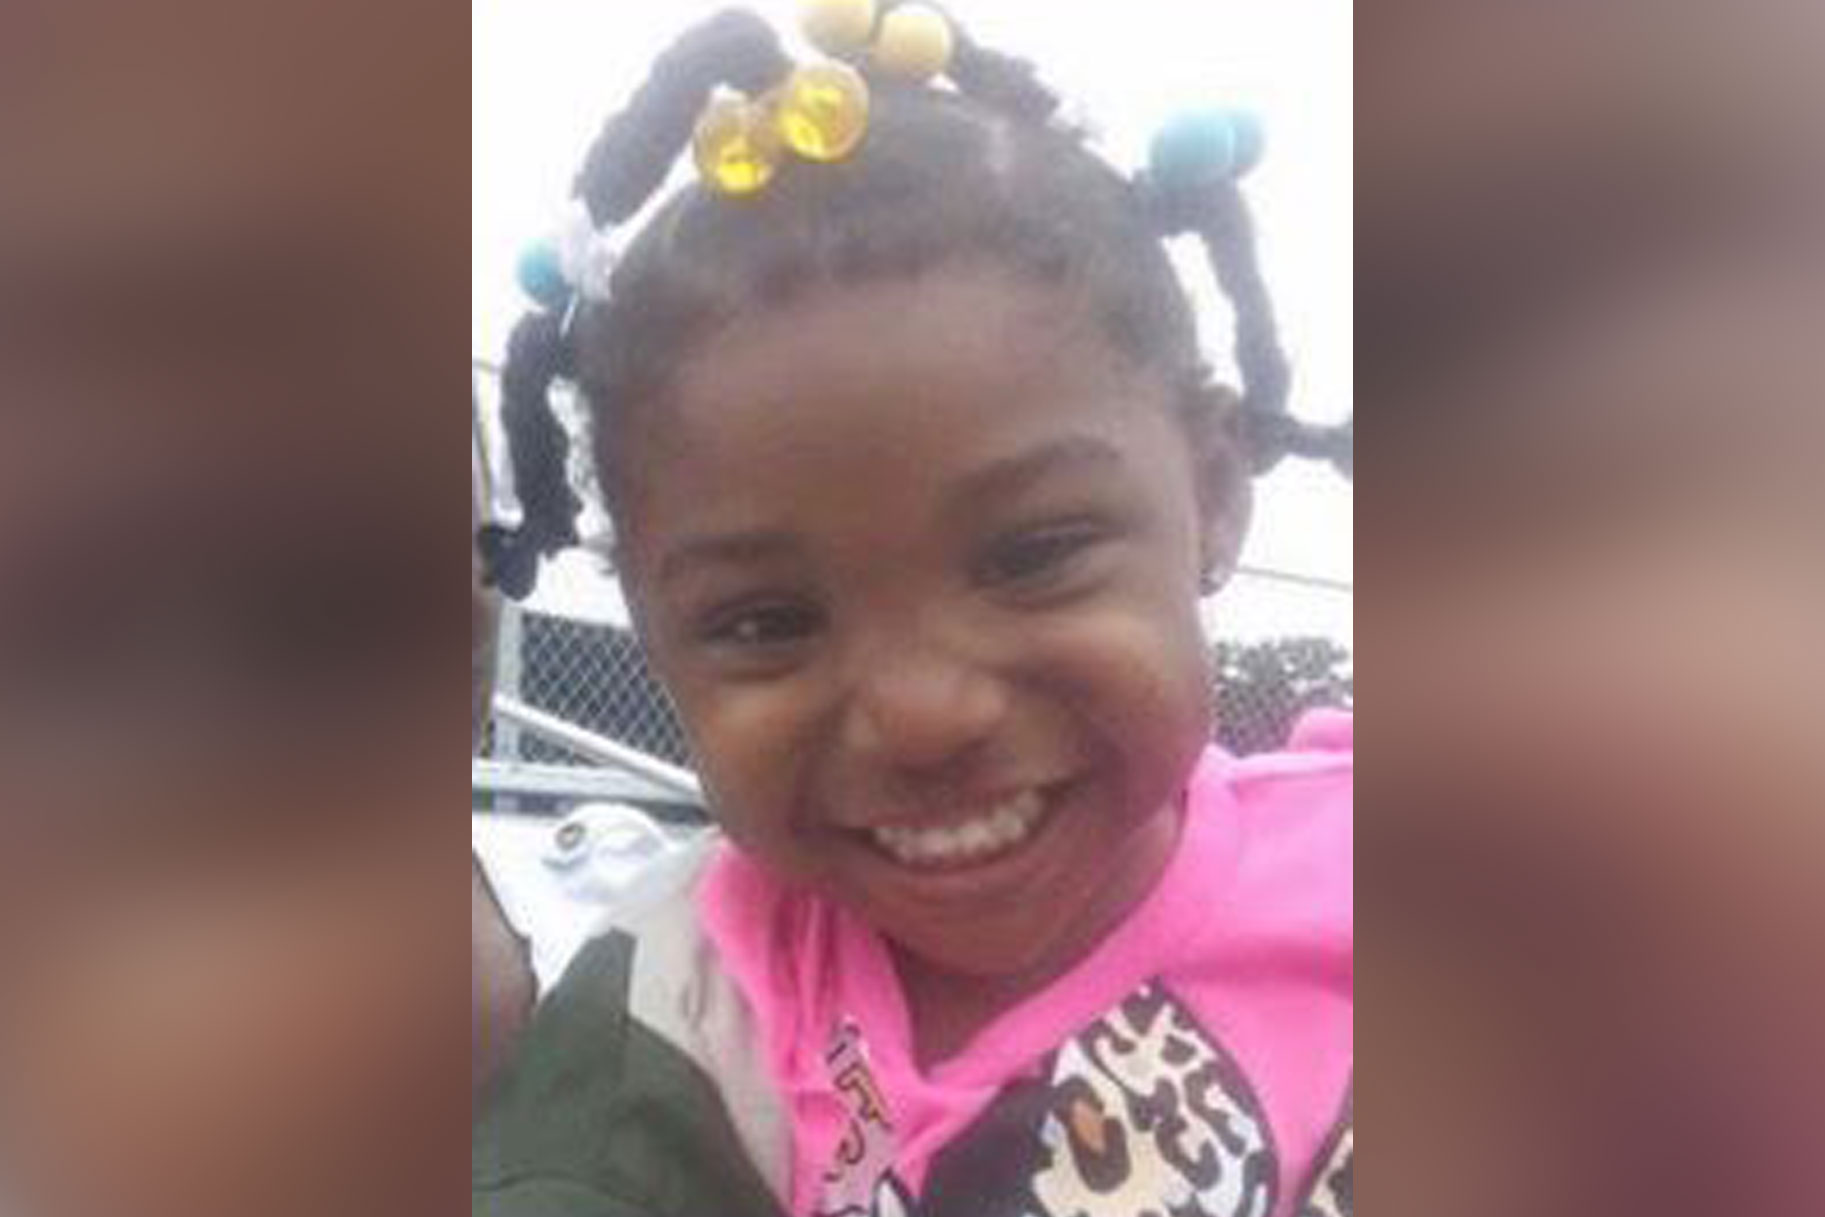 Nawawalang Alabama Girl Kamille 'Cupcake' na si McKinney Namatay Mula sa Pagdurusa, Sinabi ng Mga Opisyal